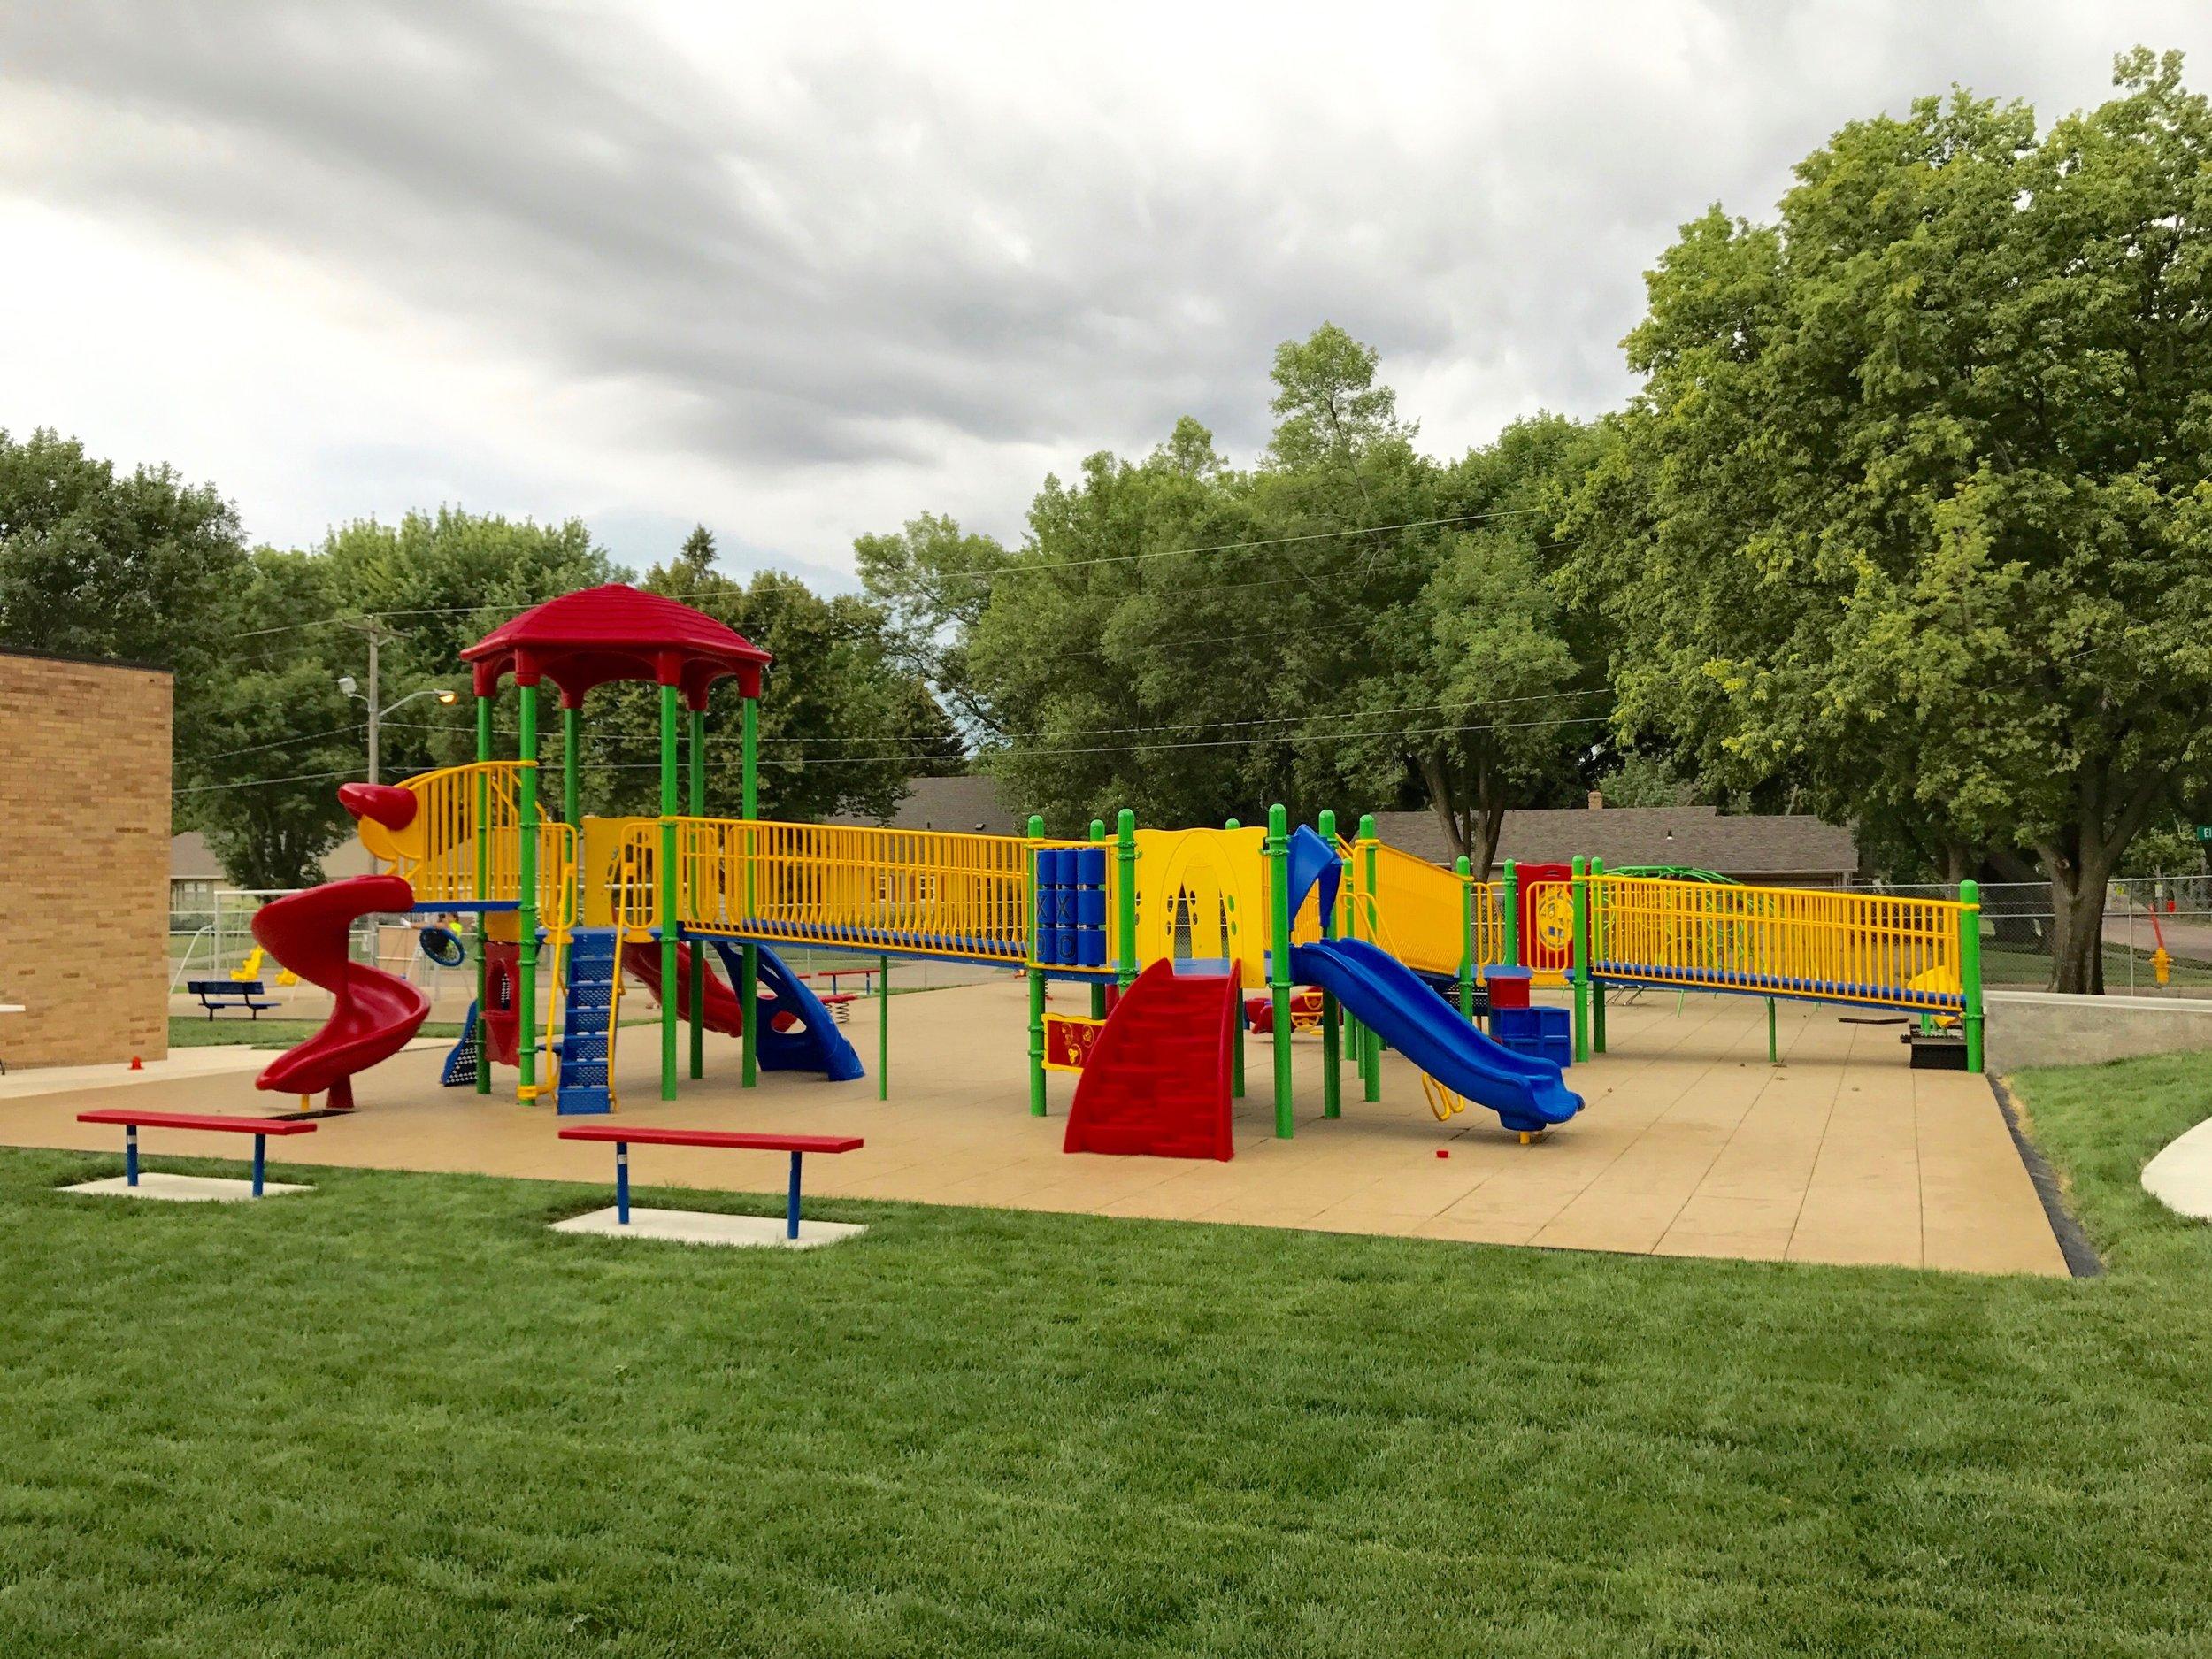 LifeScape Foundation, Sioux Falls, SD